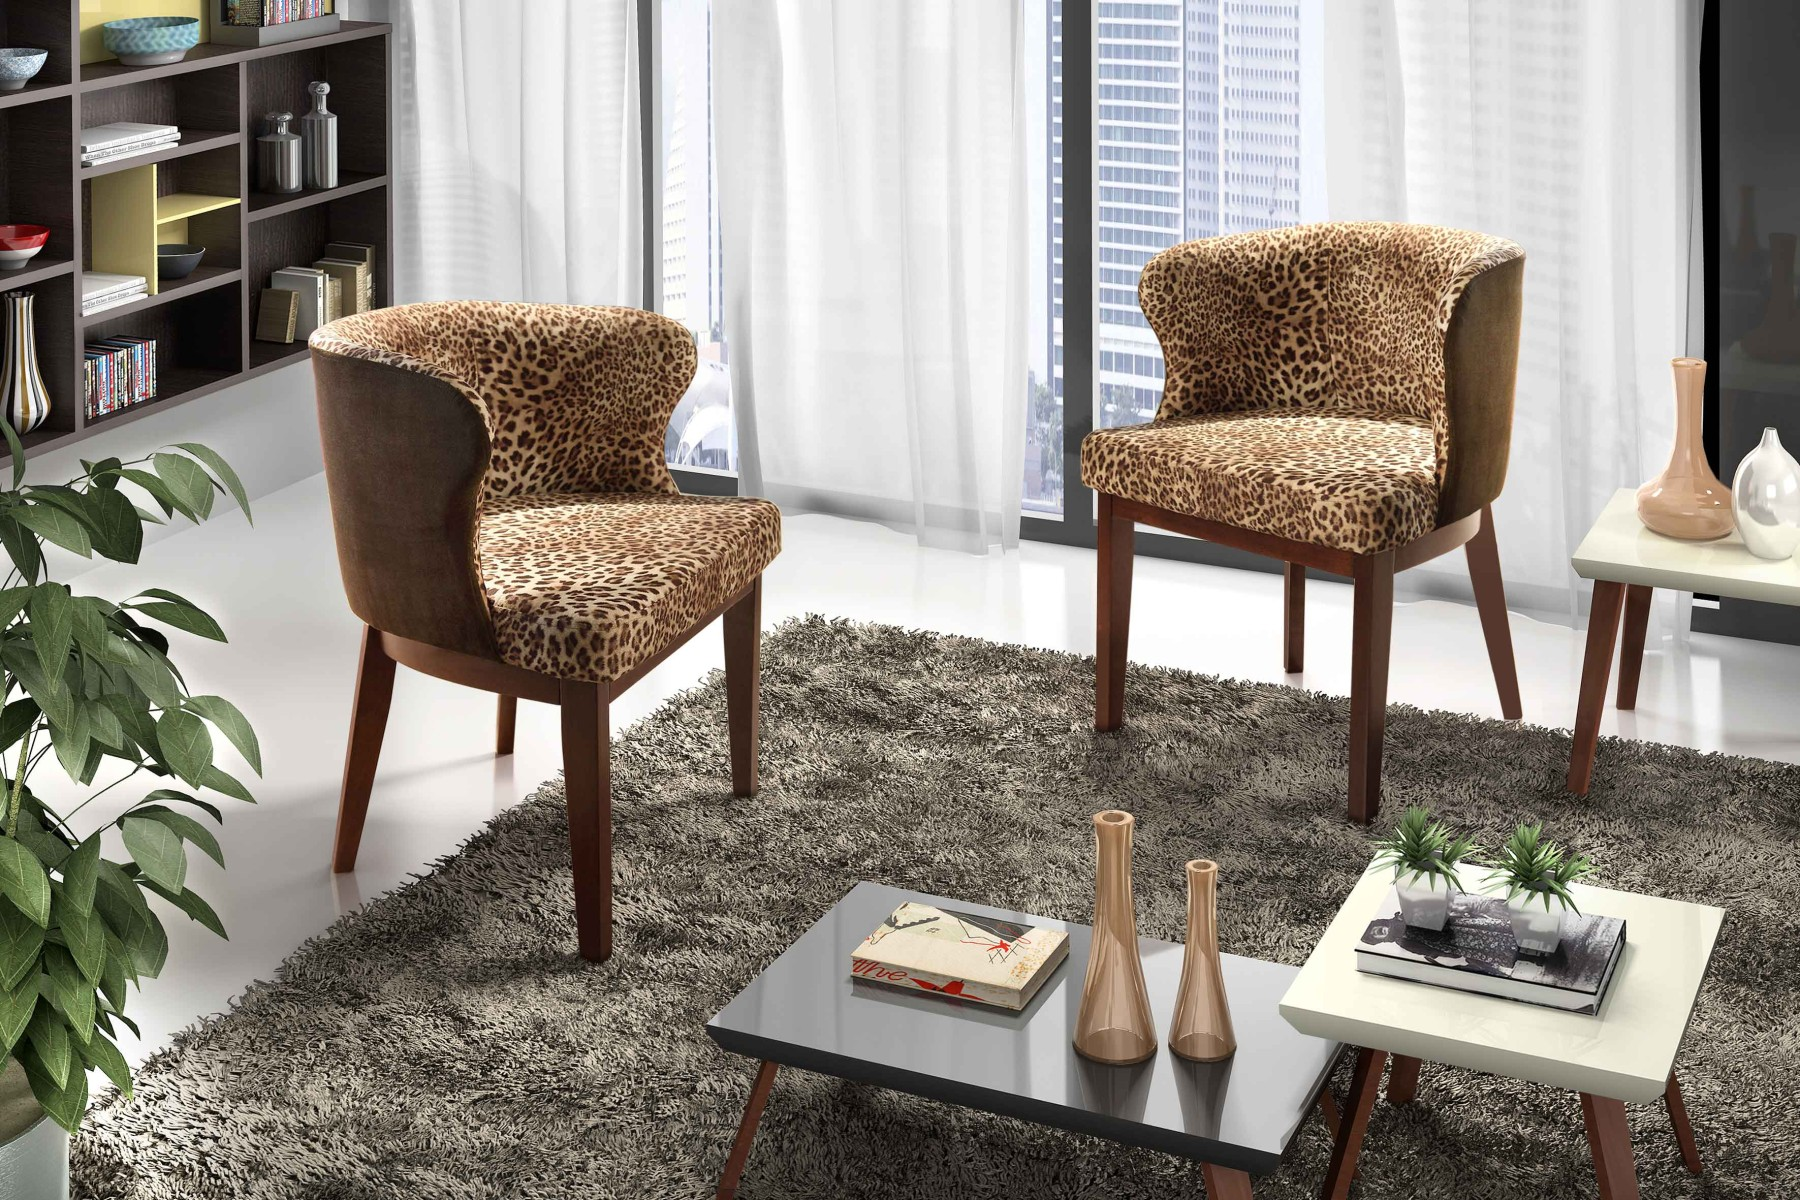 Salas De Jantar Kr Moveis ~ KR Móveis  Salas de Jantar e Cadeiras Decorativas  Estúdio Miron